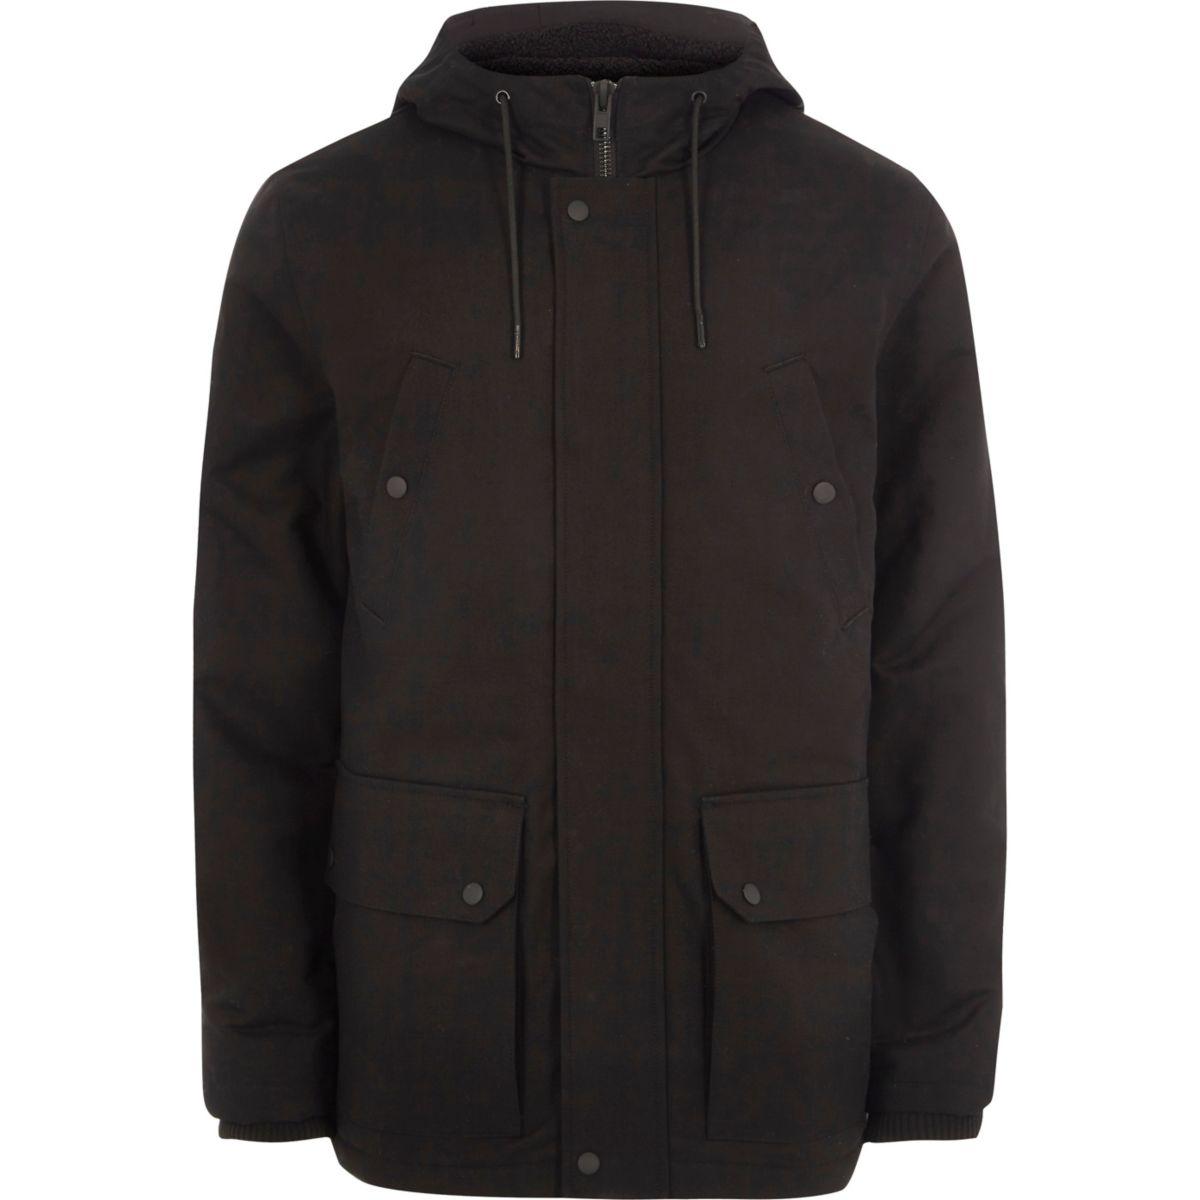 Black hooded borg lined jacket